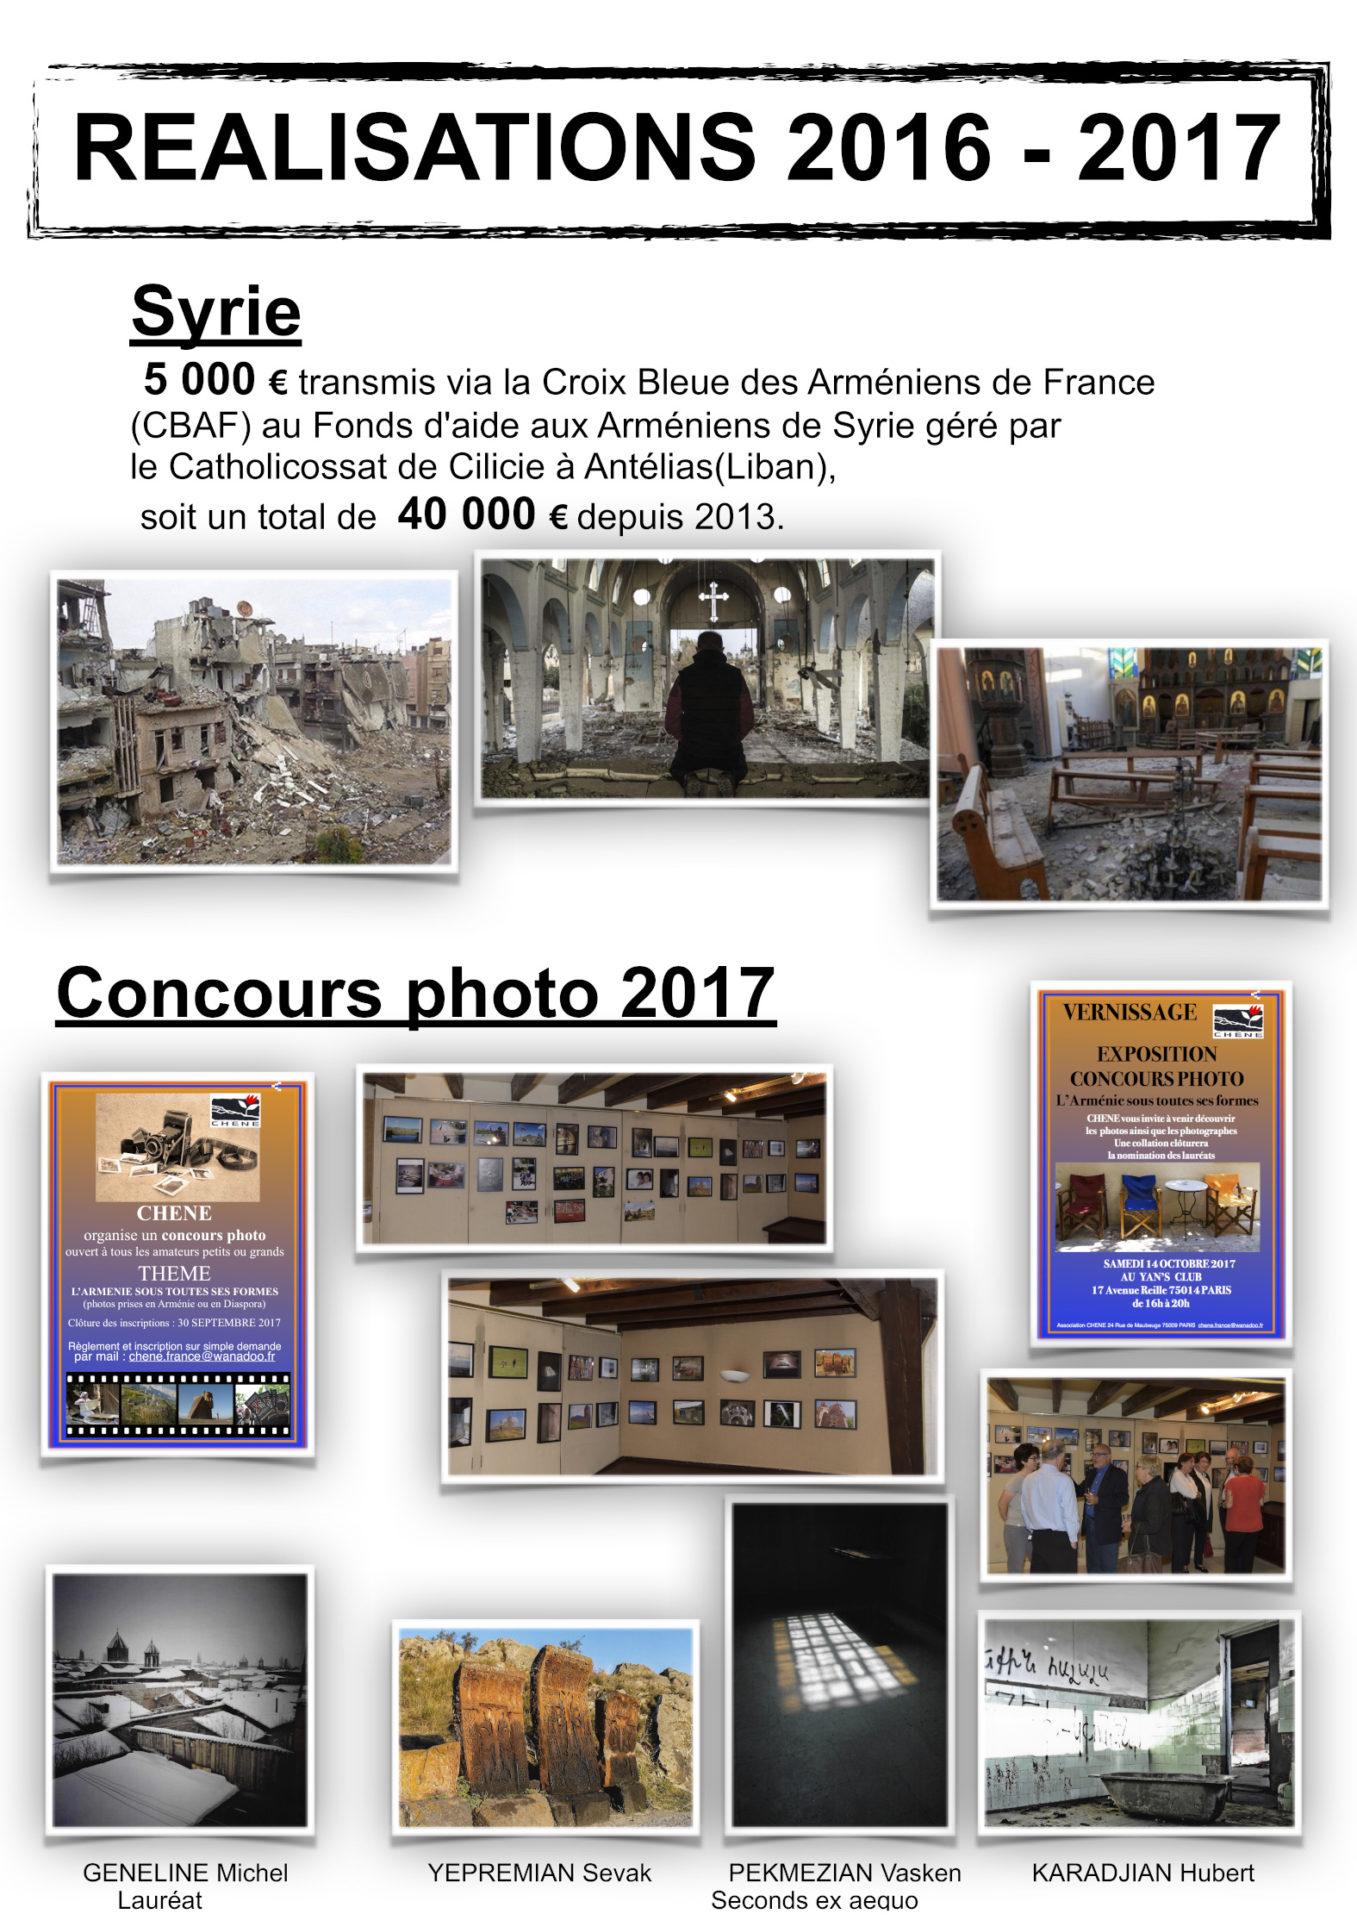 Braderie 2017 - Le stand CHENE